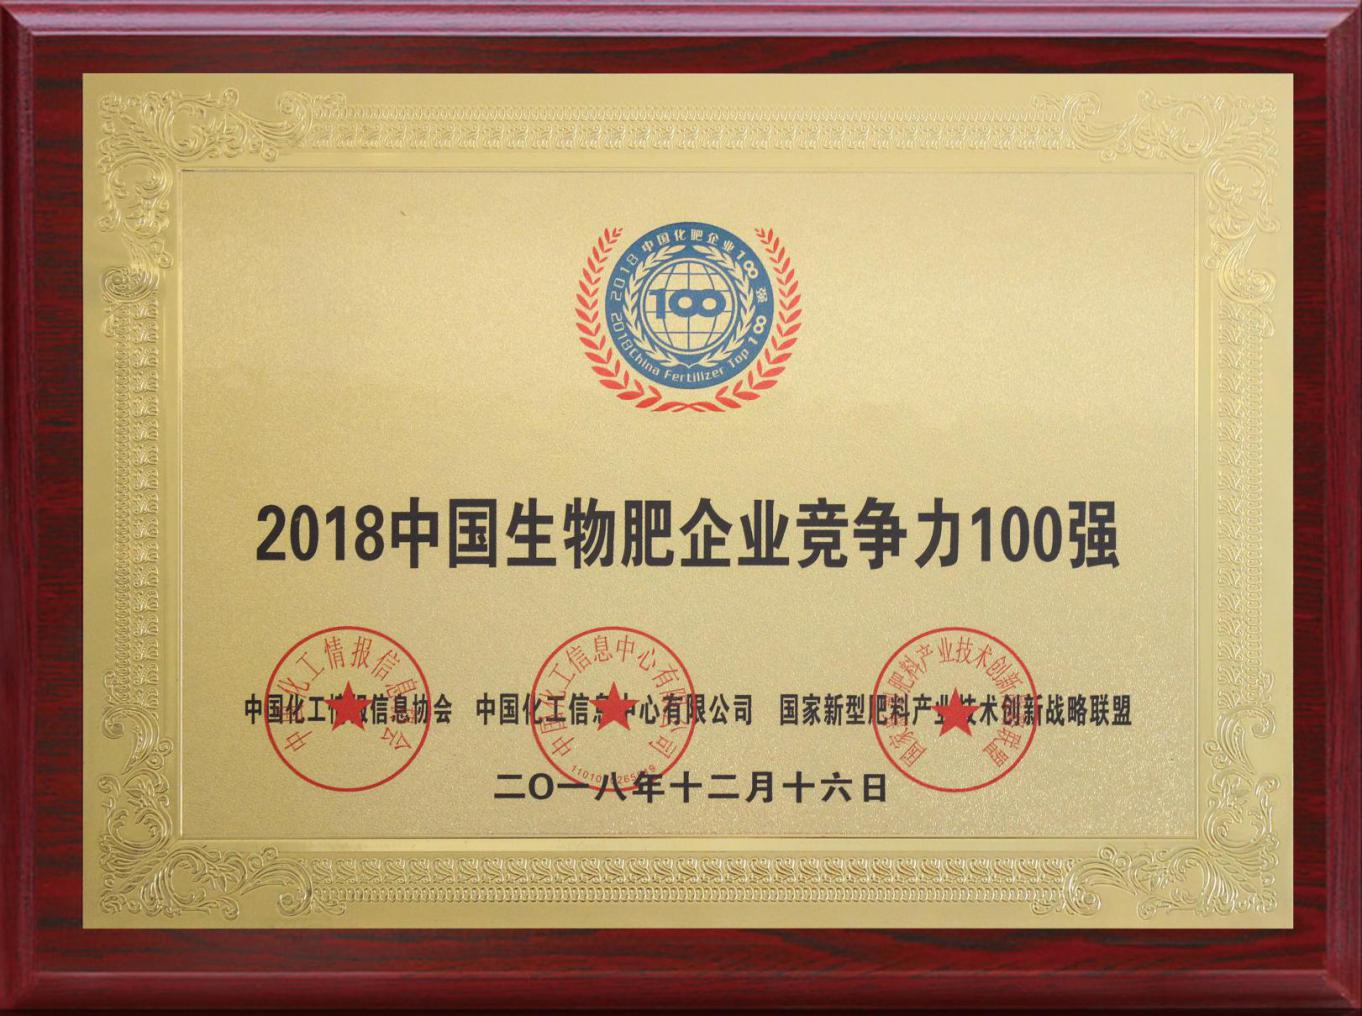 2018生物肥百强.png